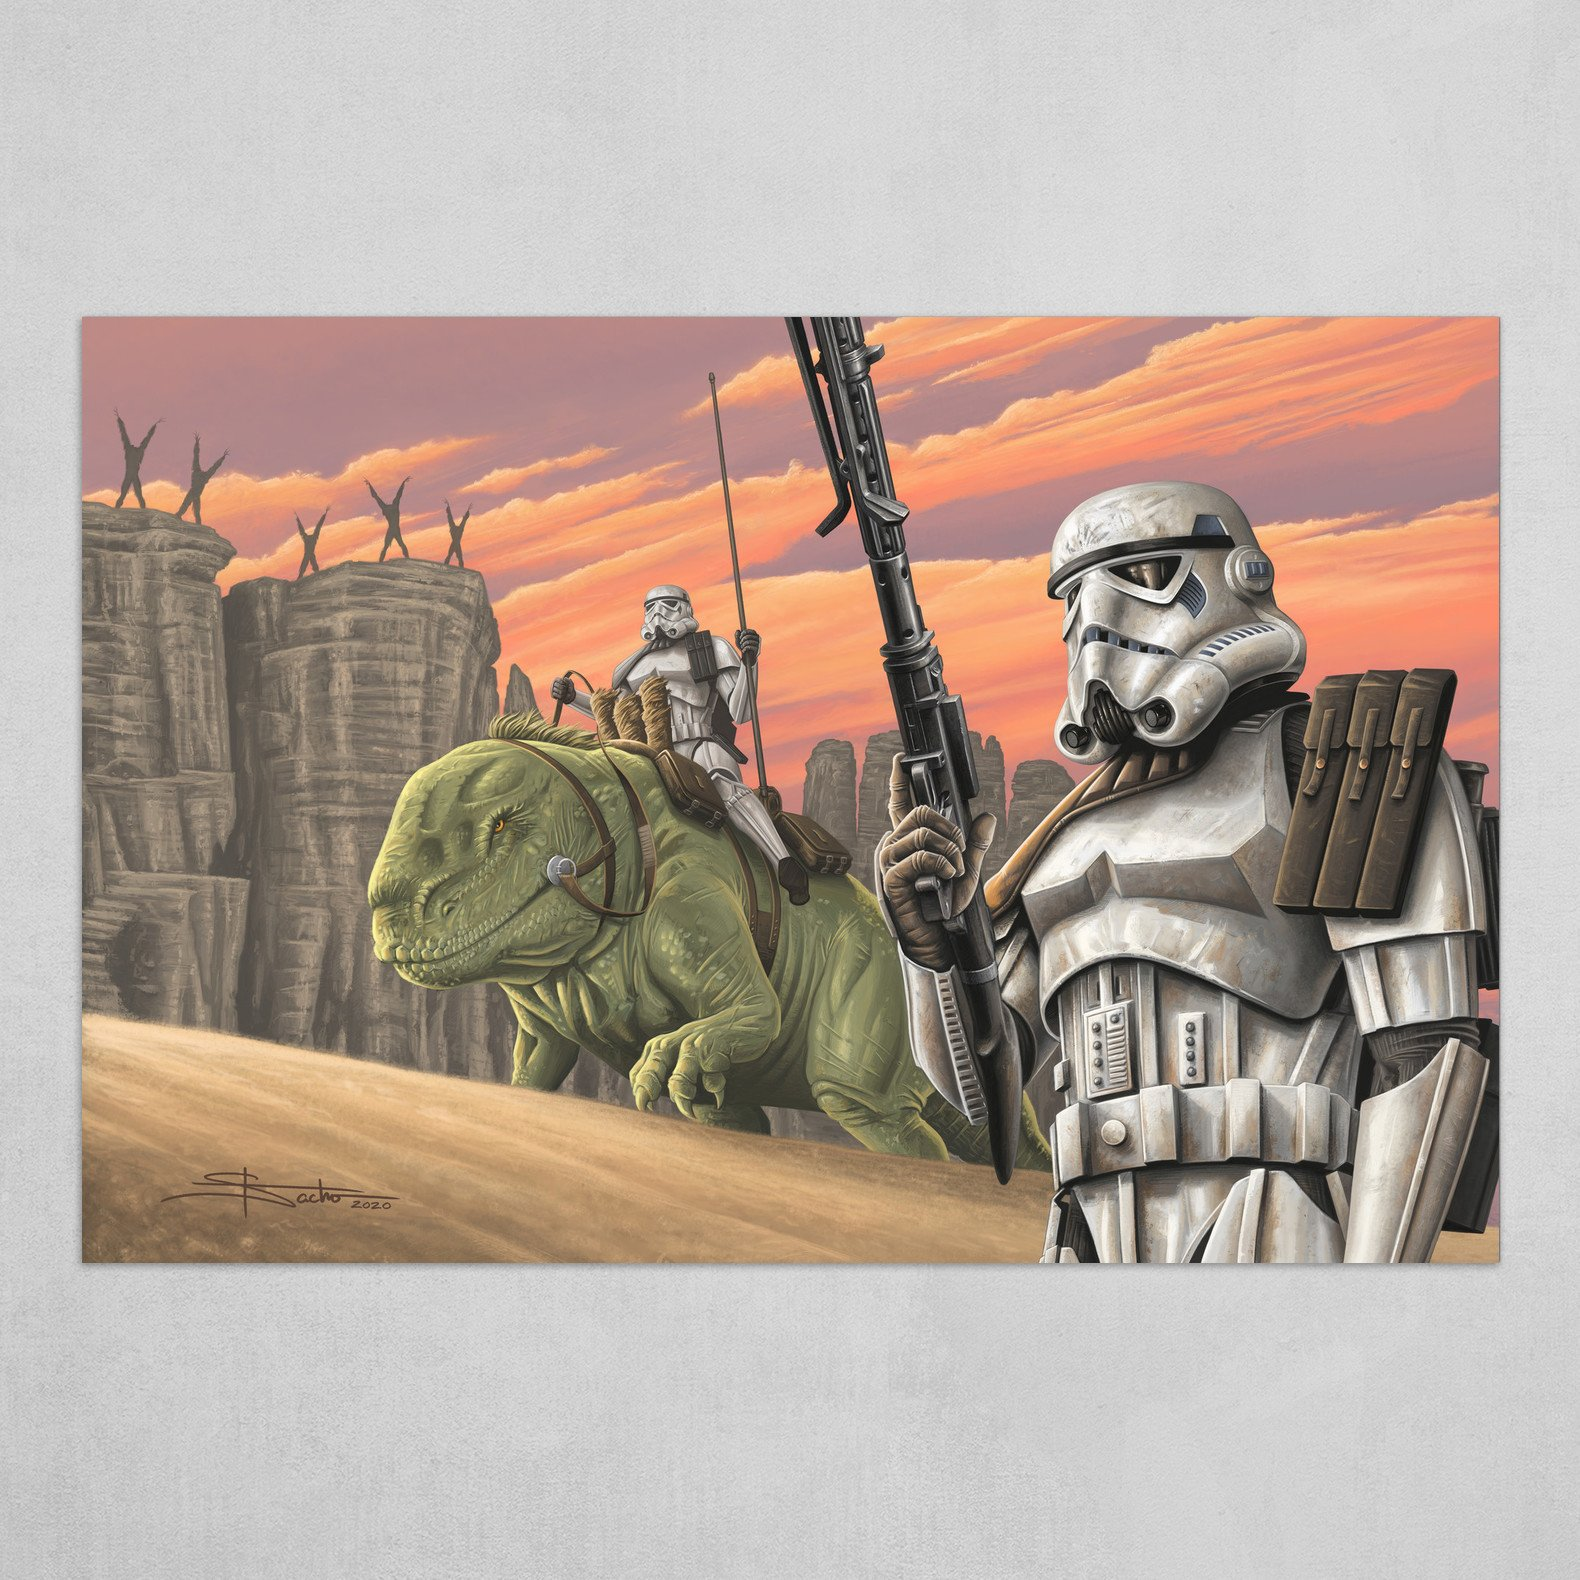 The Badlands of Tatooine